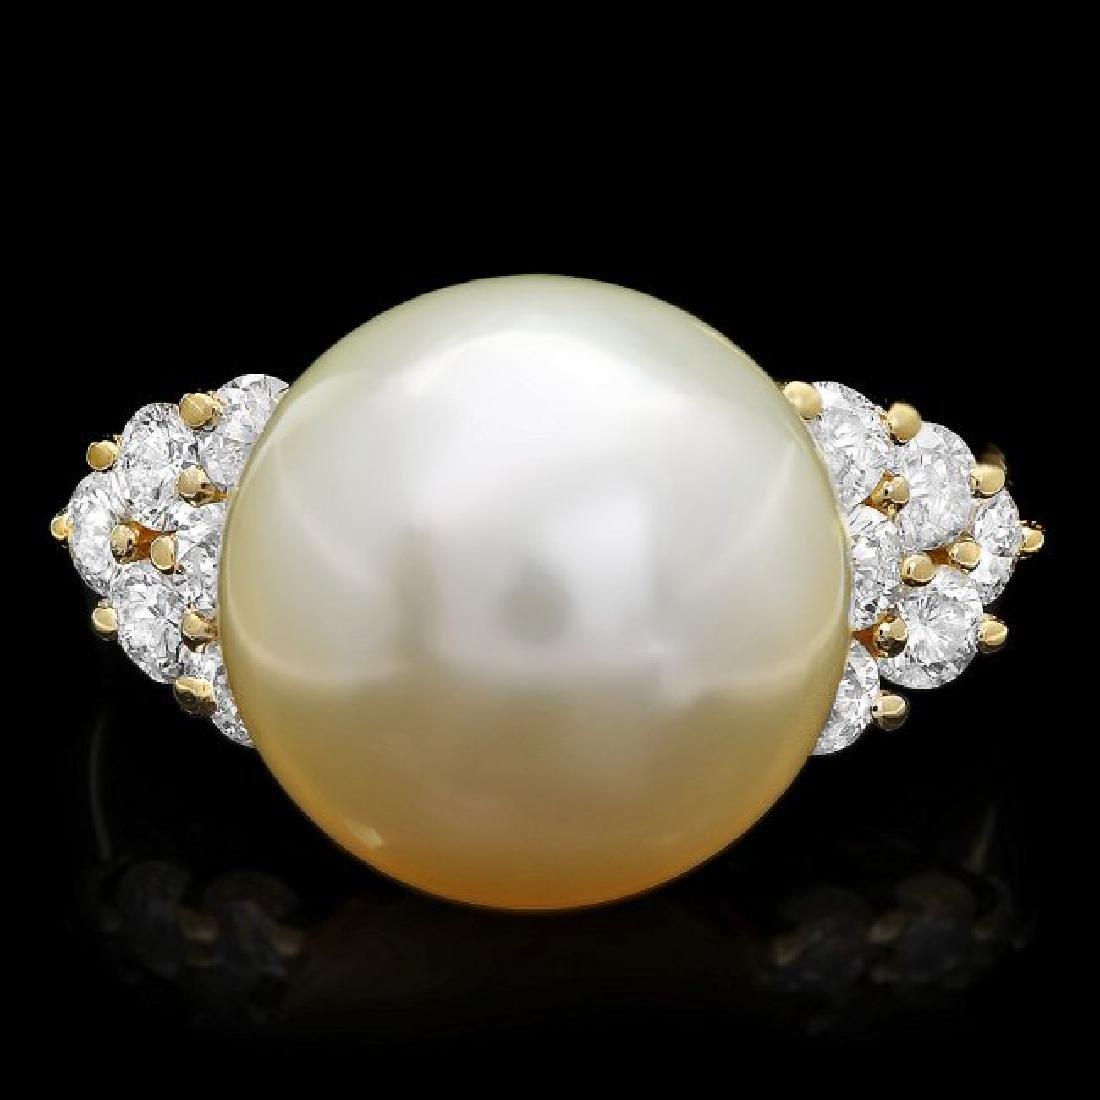 14k Gold 14 X 14mm Pearl 1.15ct Diamond Ring